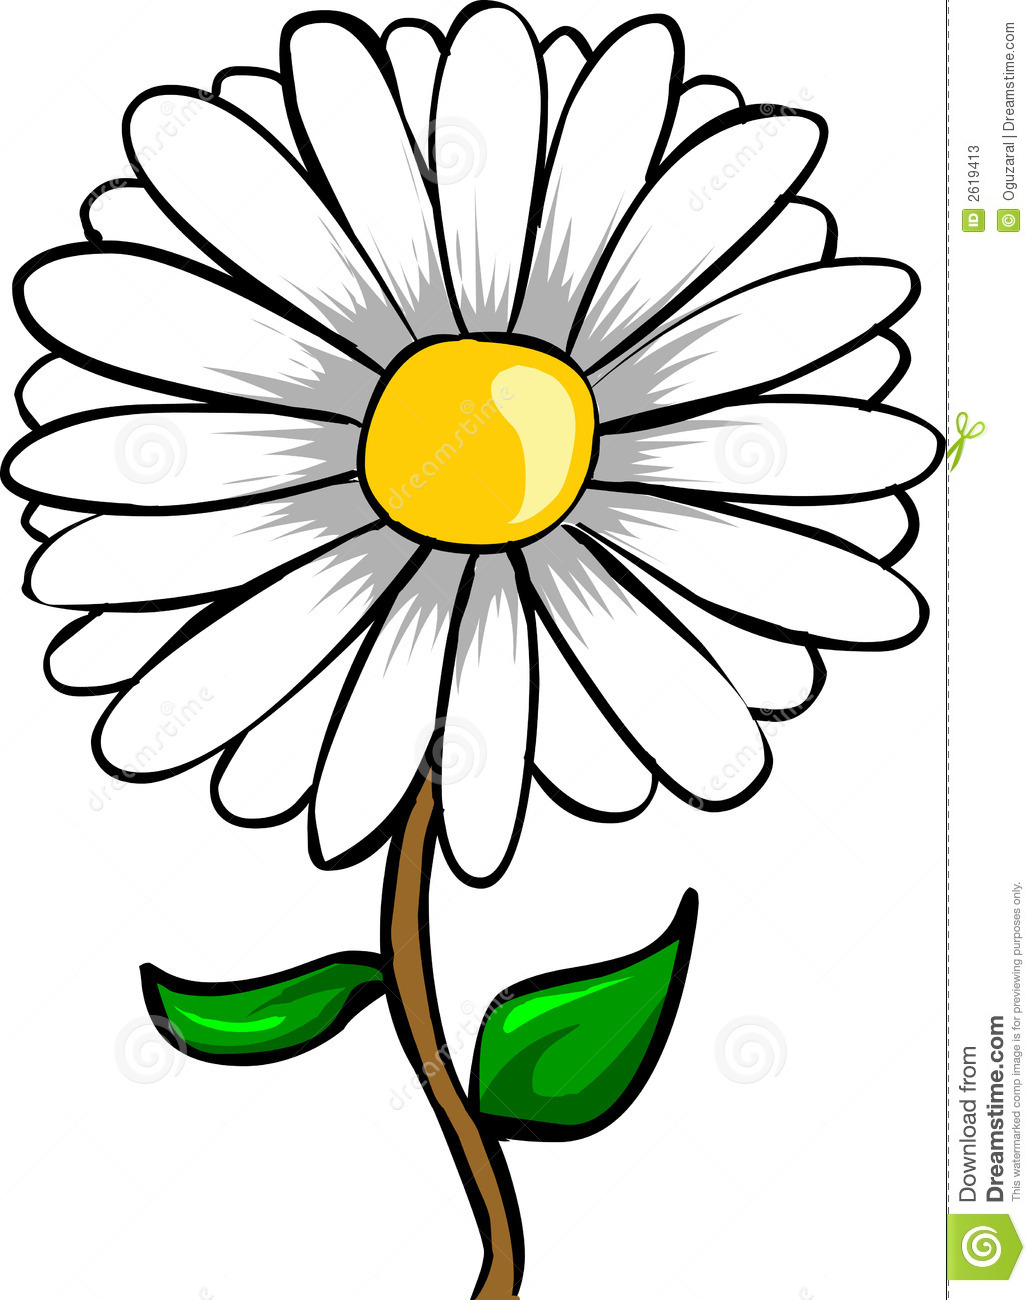 1036x1300 Top 77 Daisy Flower Clip Art